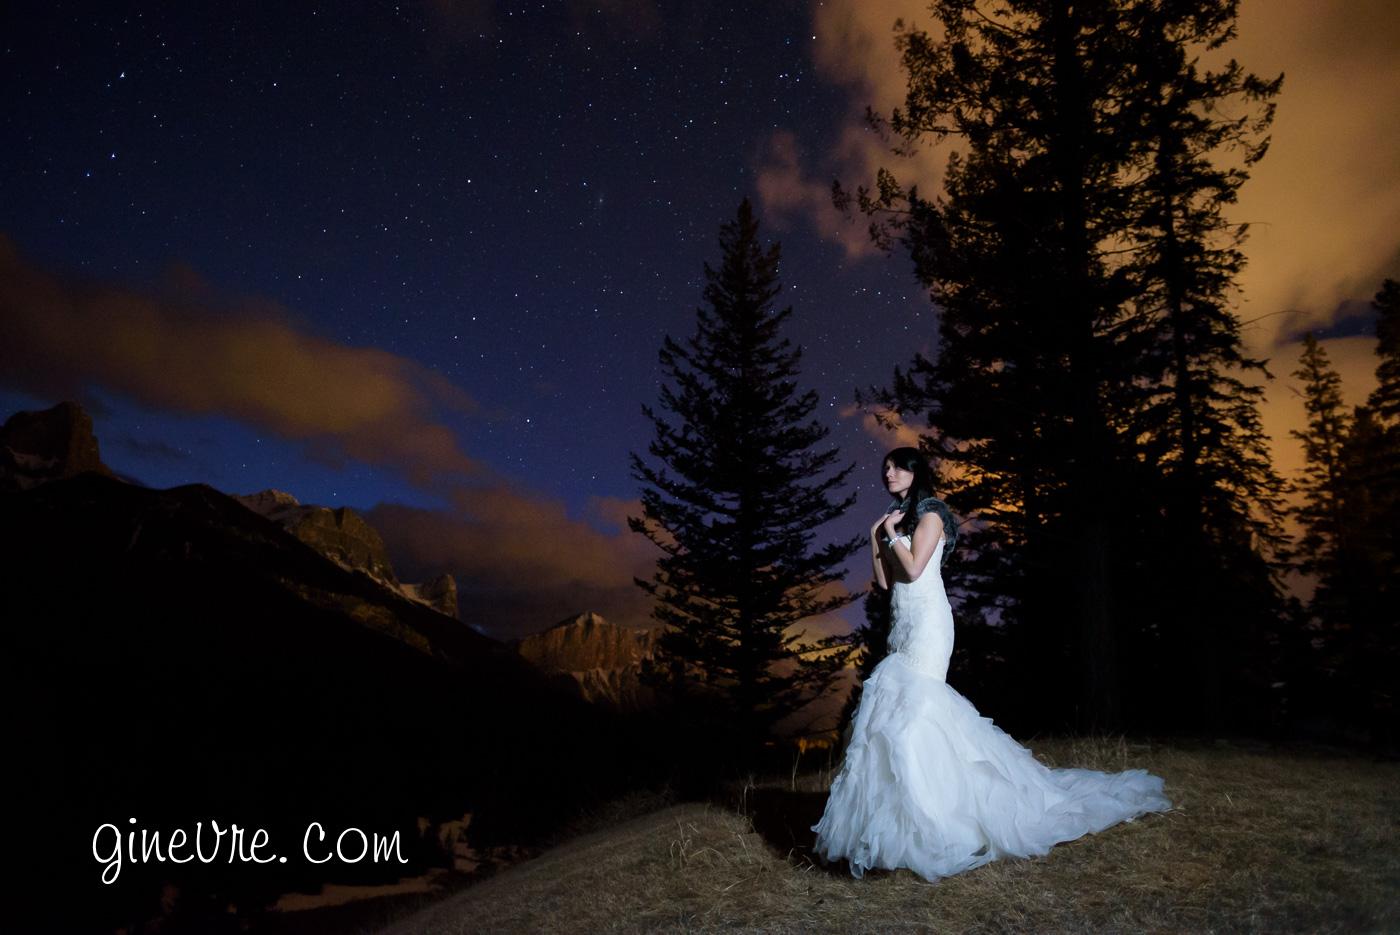 canmore wedding stewart creek night photo